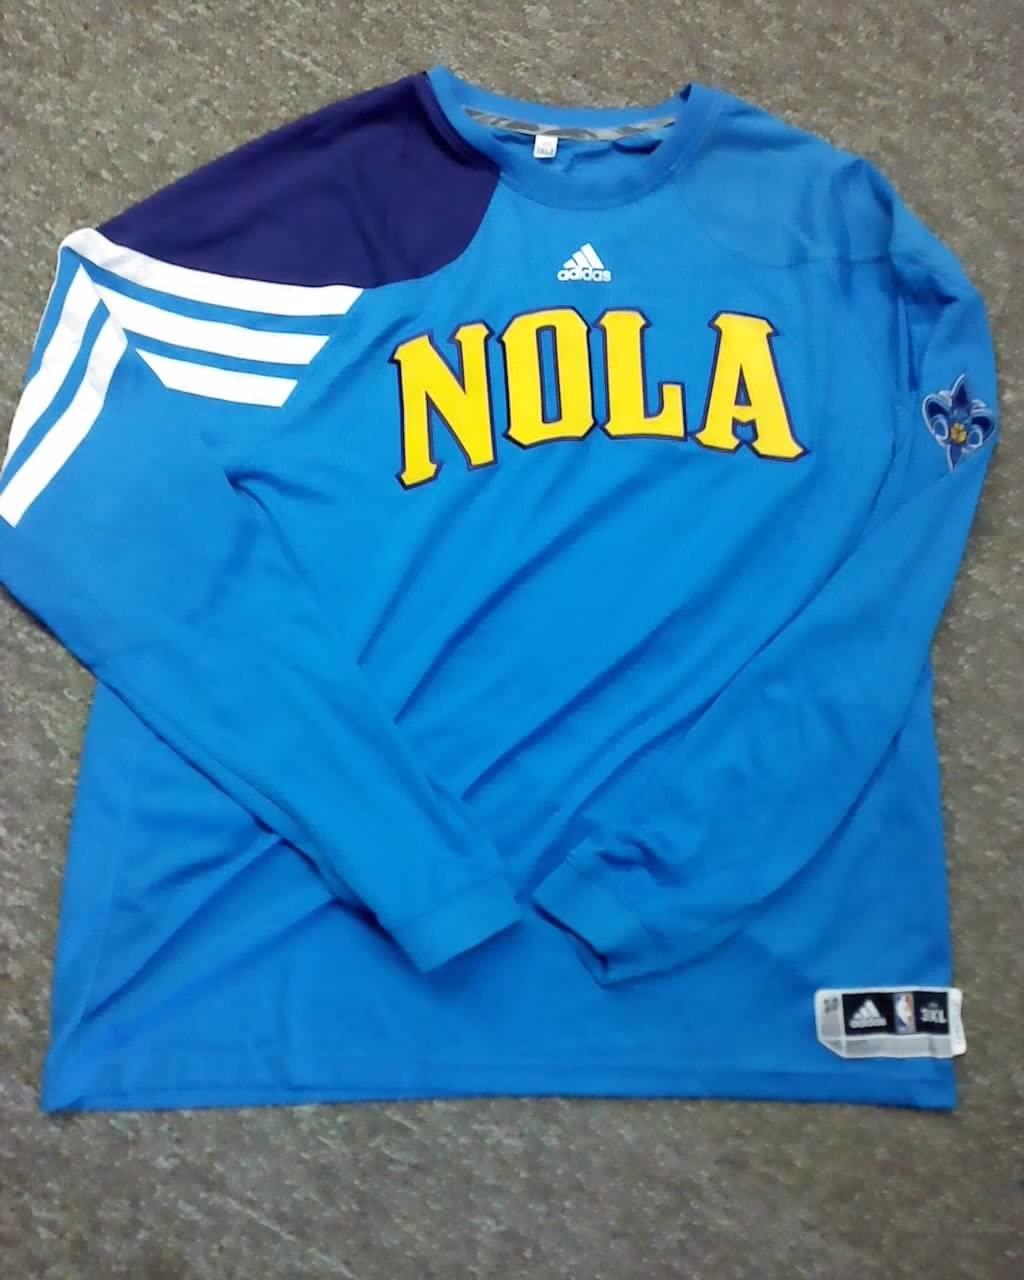 Chris Johnson New Orleans Hornets 2011-2012 NOLA Game Worn L/S Shooting Shirt